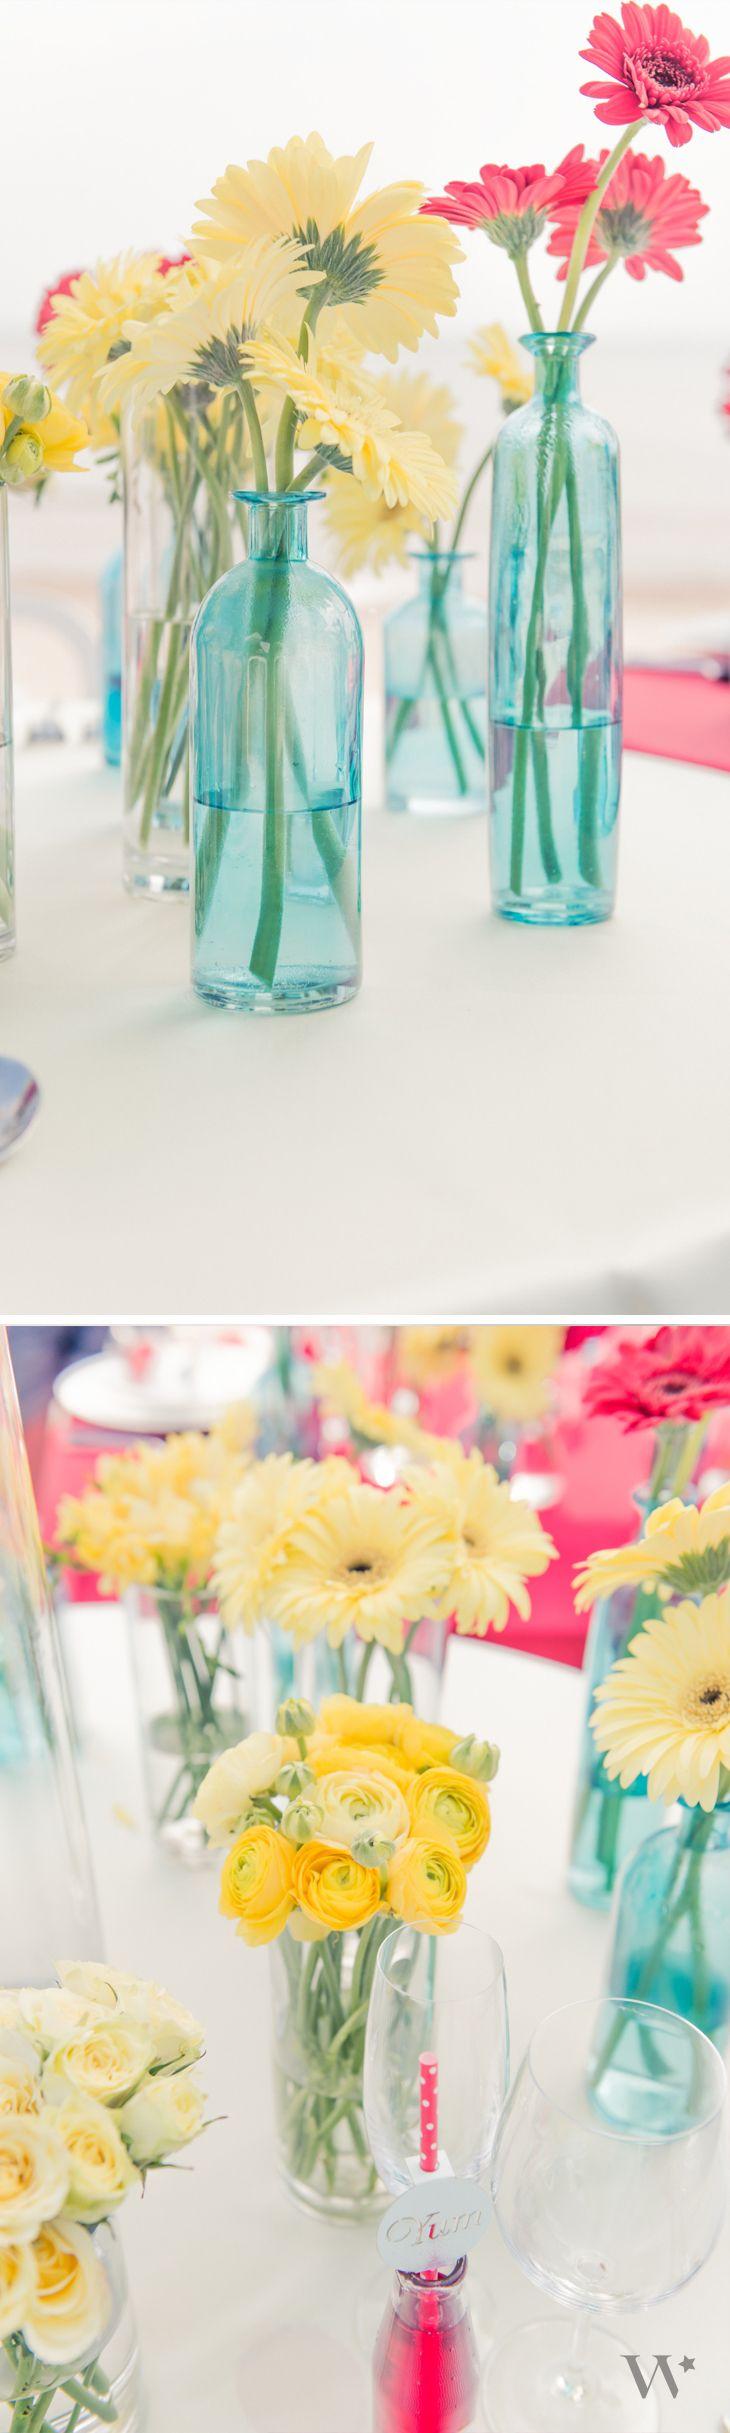 Wedding Tablescape   Wedding Centerpiece   Floral Wedding Centerpiece   Flowers http://www.weddingstar.com/product/decorating-glass-bottle-set